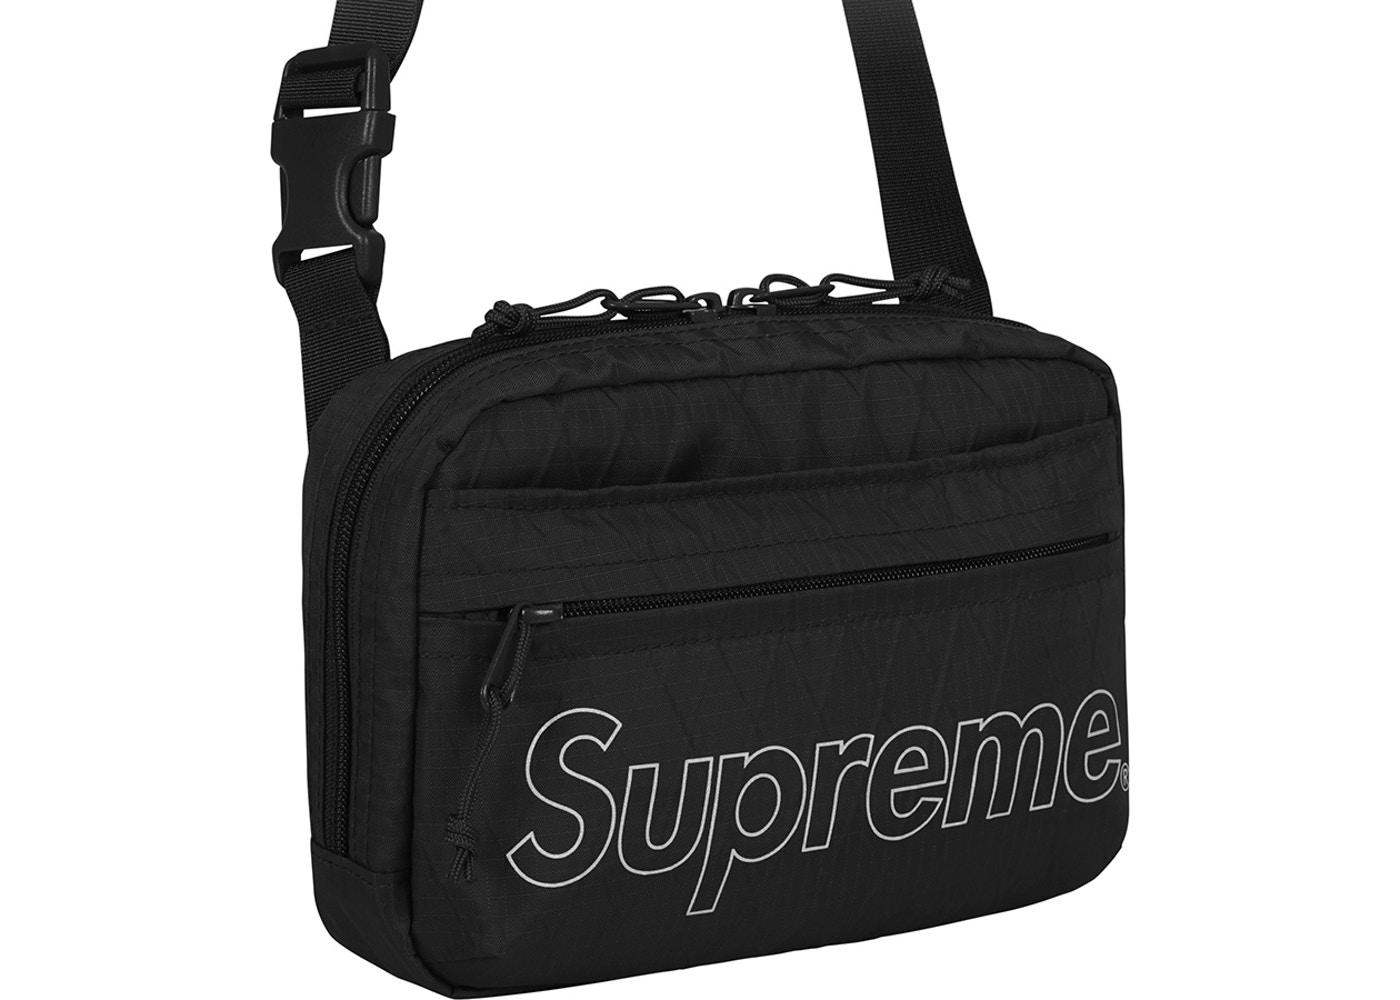 7aa67f15 Supreme Shoulder Bag (FW18) Black - StockX News